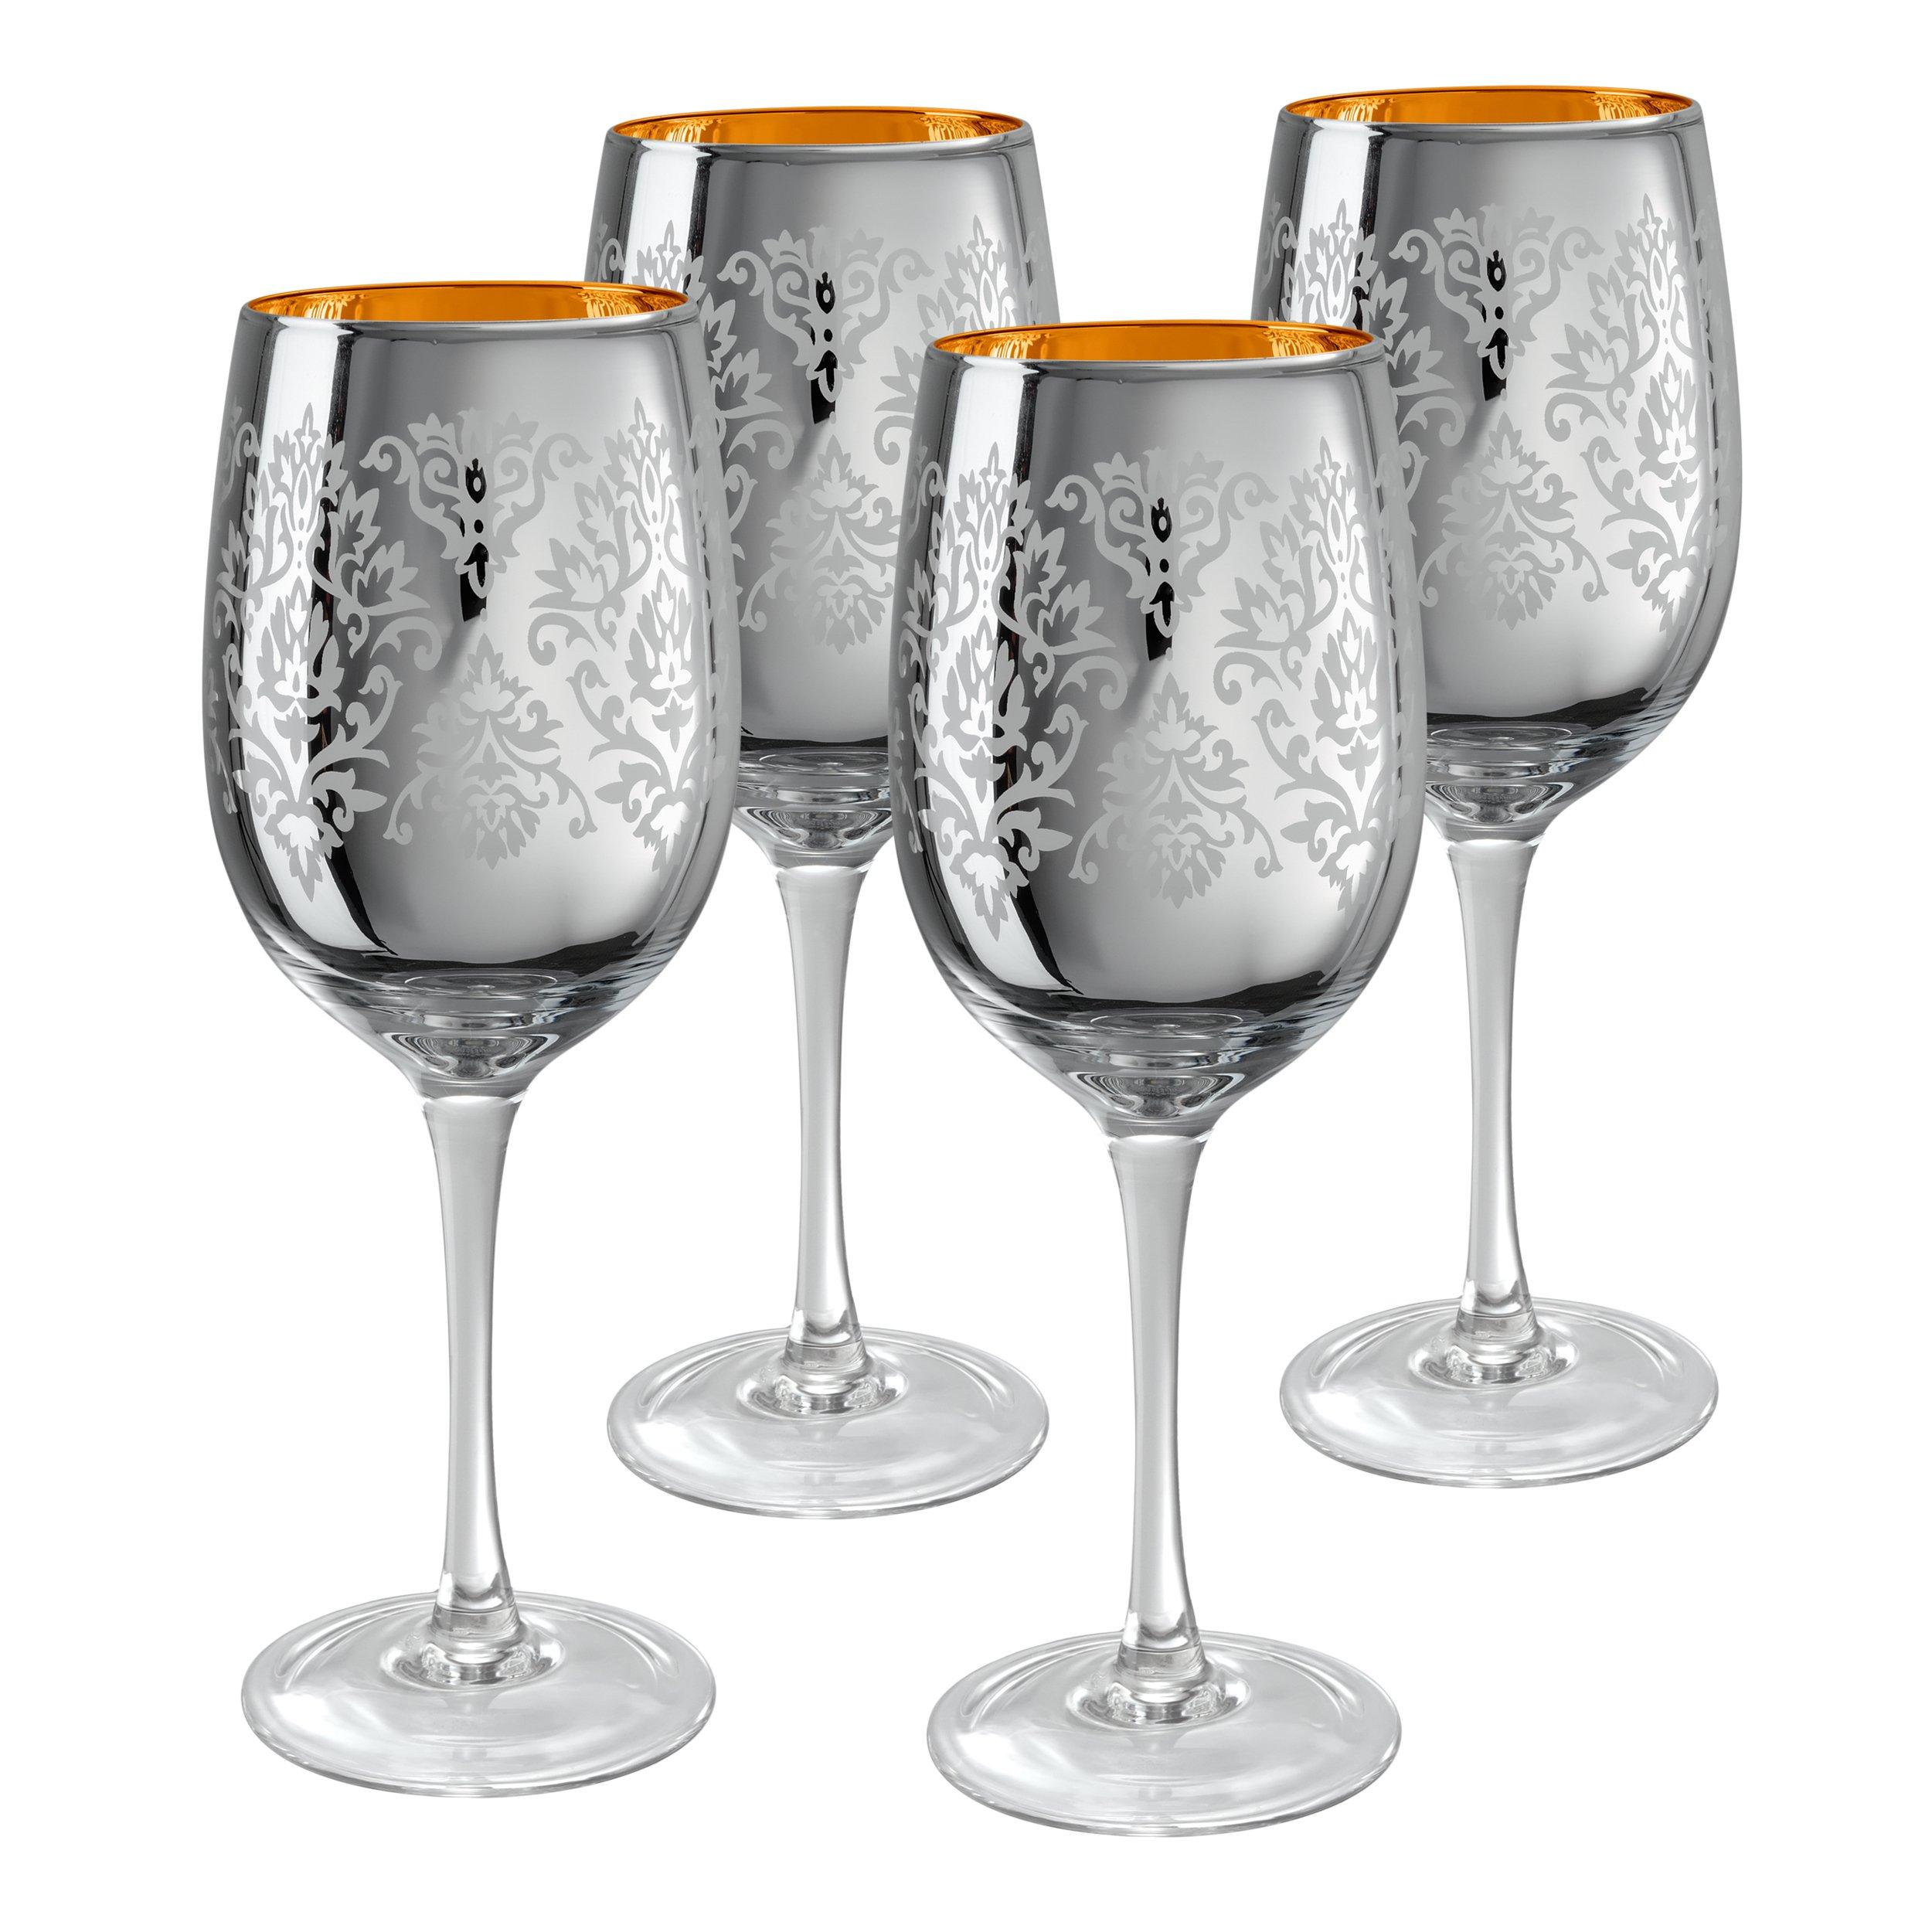 Artland Brocade Wine Glass, 15 oz, Silver, Set of 4